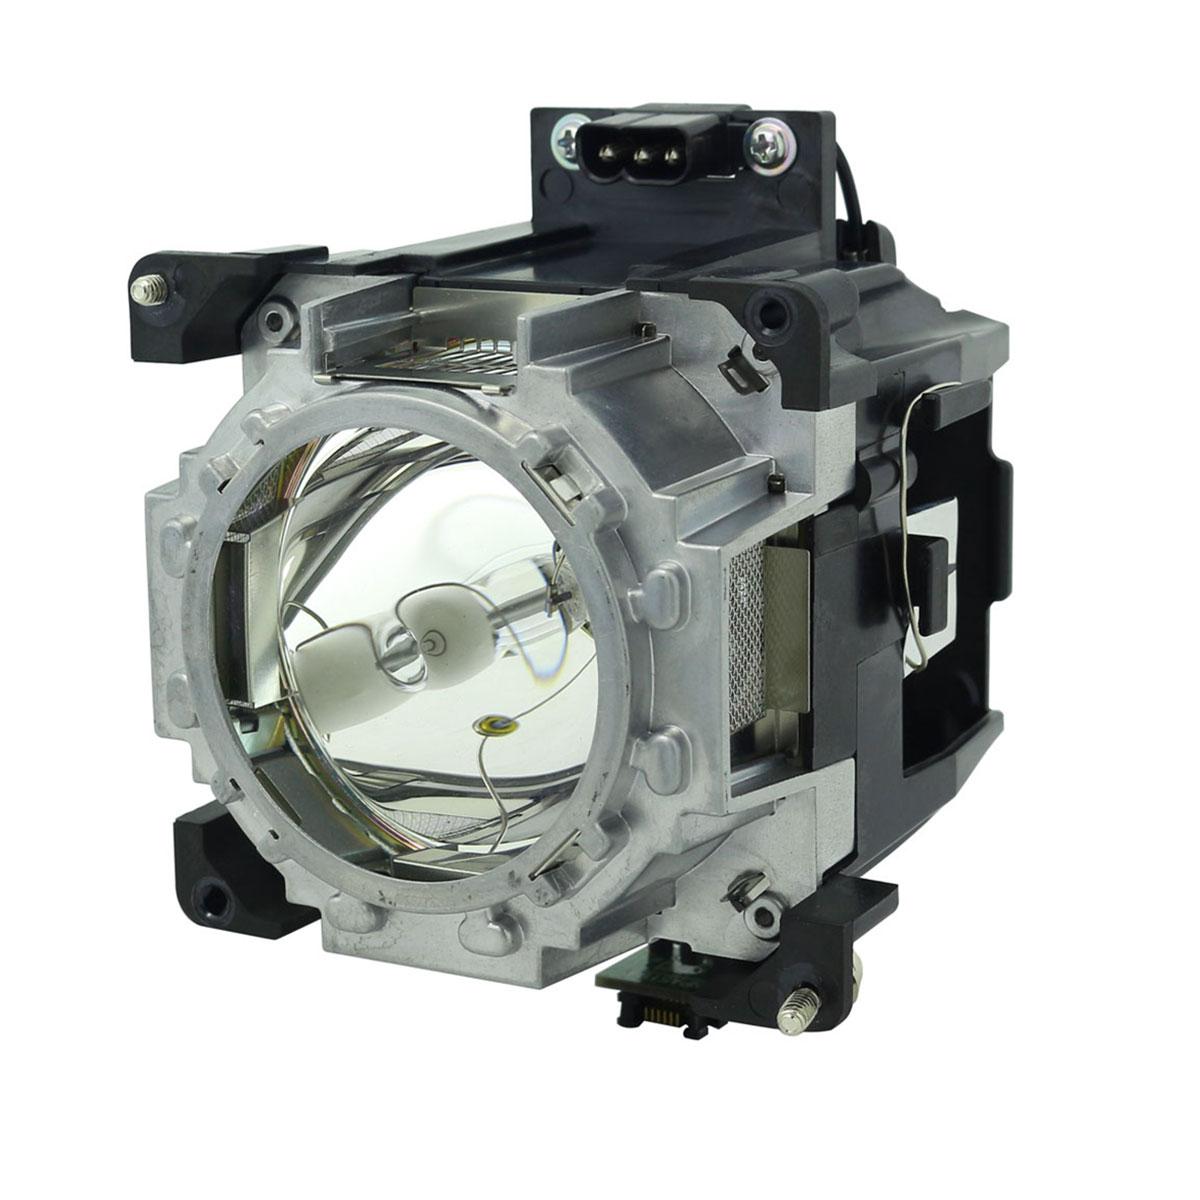 Original Ushio Projector Lamp Replacement for Panasonic PT-DW17K (Bulb Only) - image 5 de 5